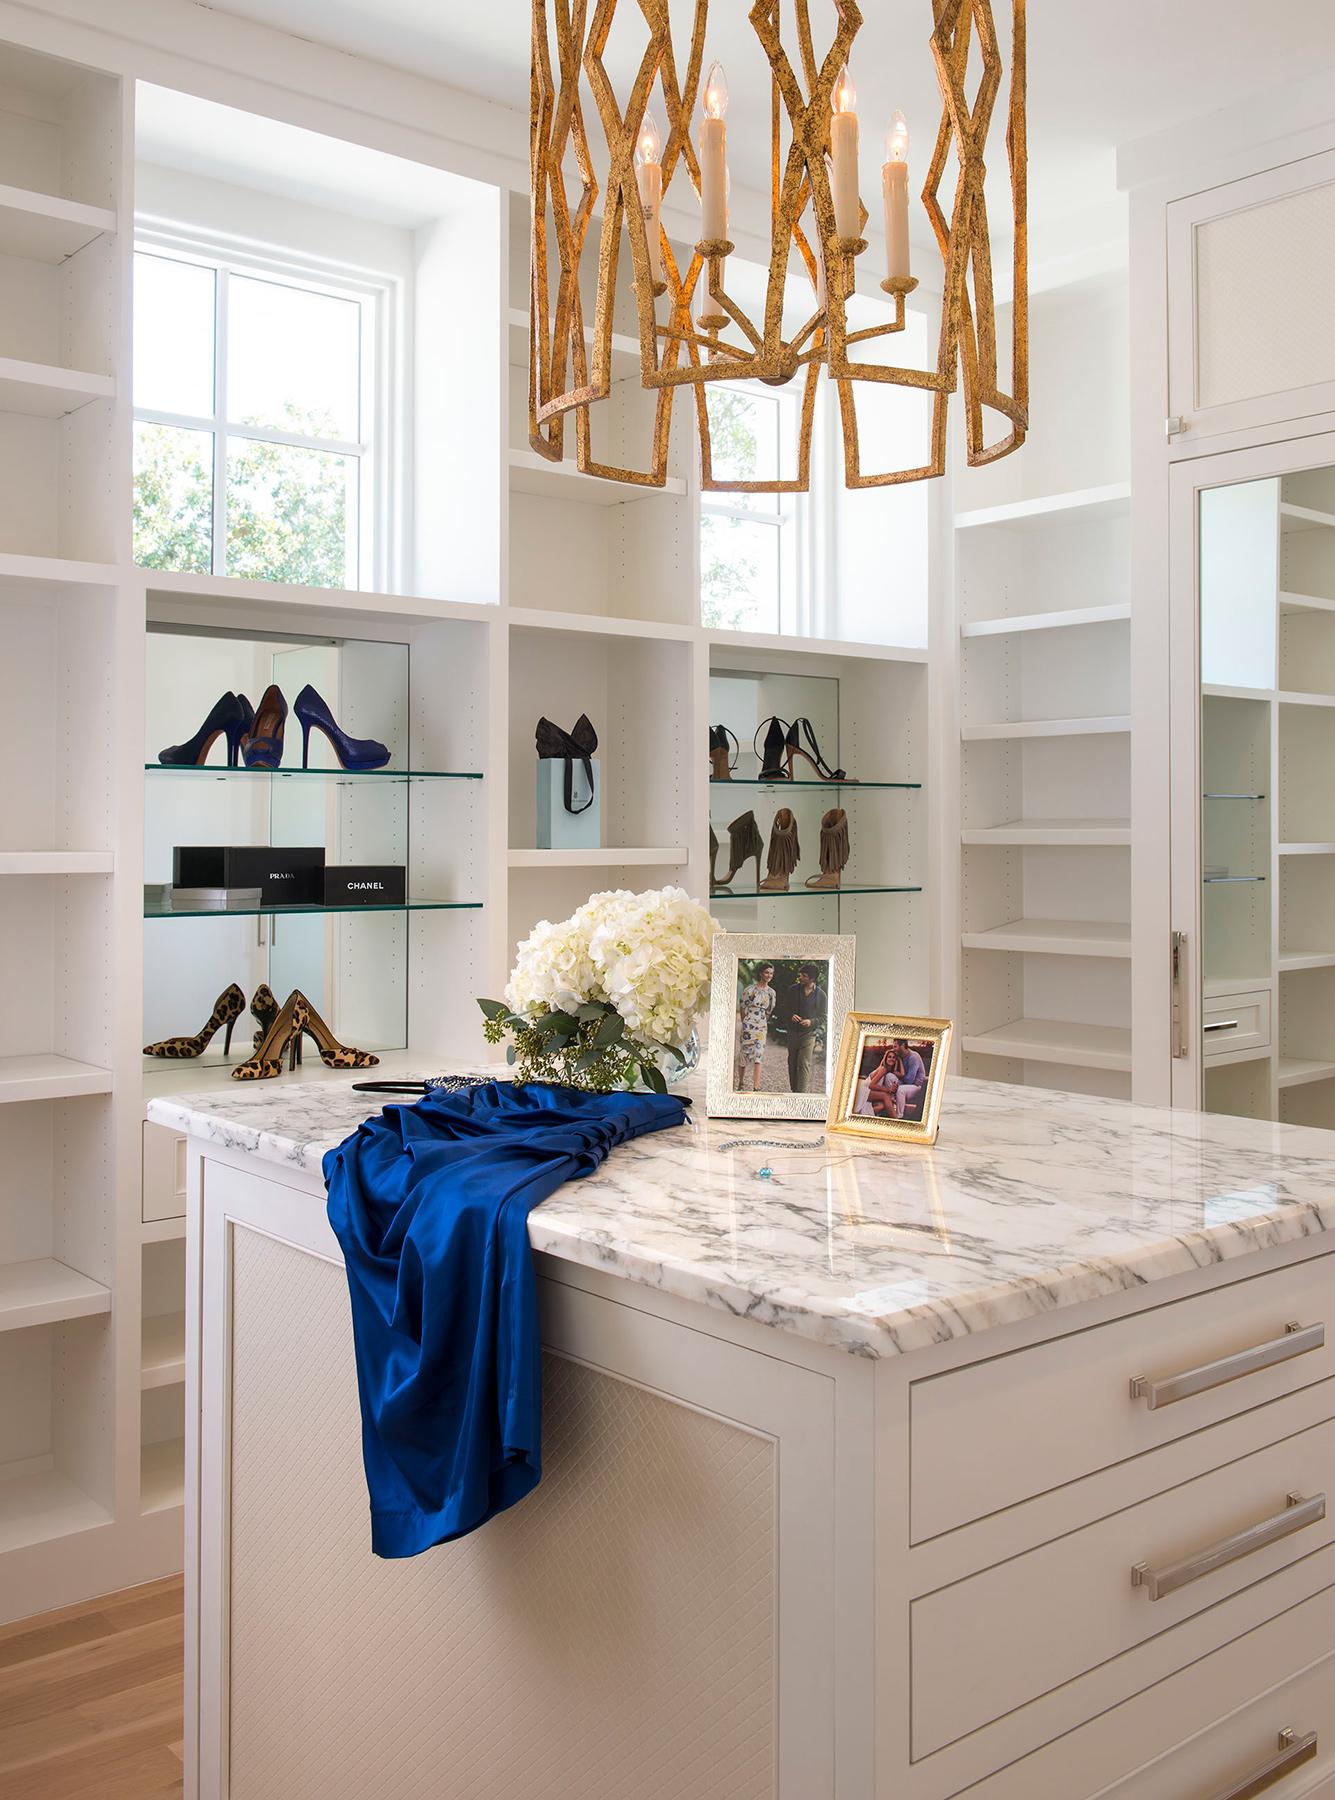 Her-master-closet